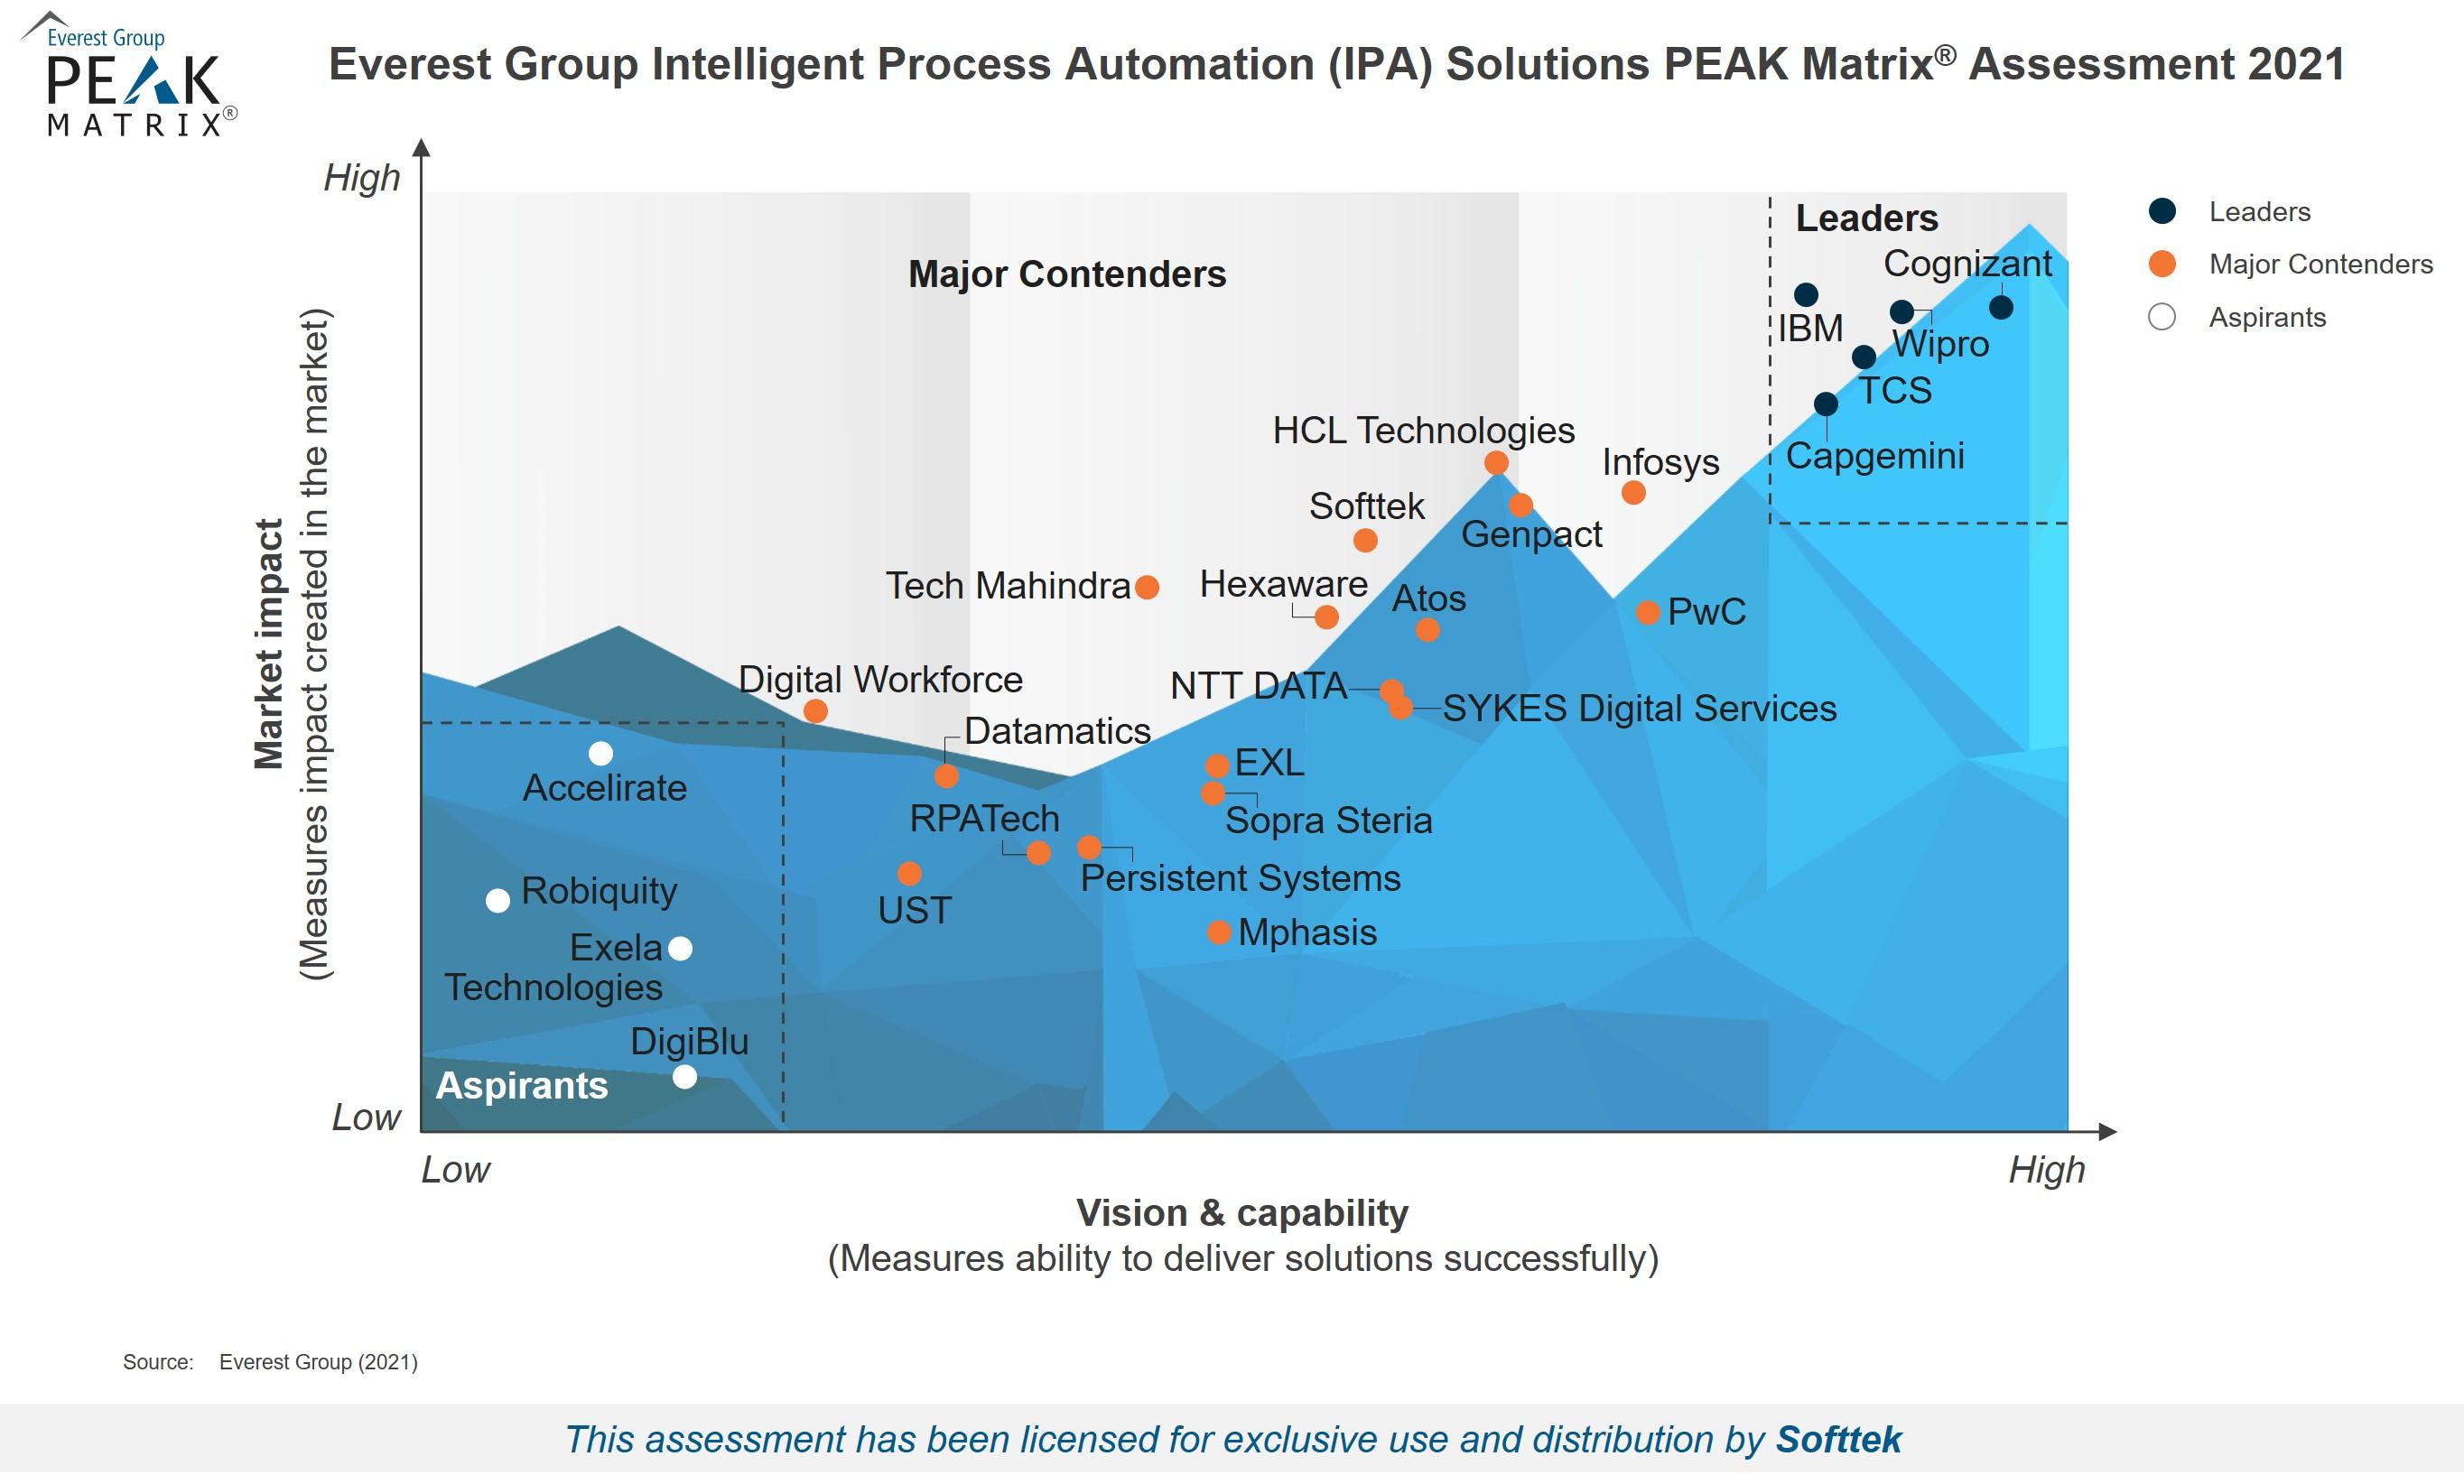 Everest Group PEAK Matrix 2021 - Intelligent Process Automation (IPA) Solutions